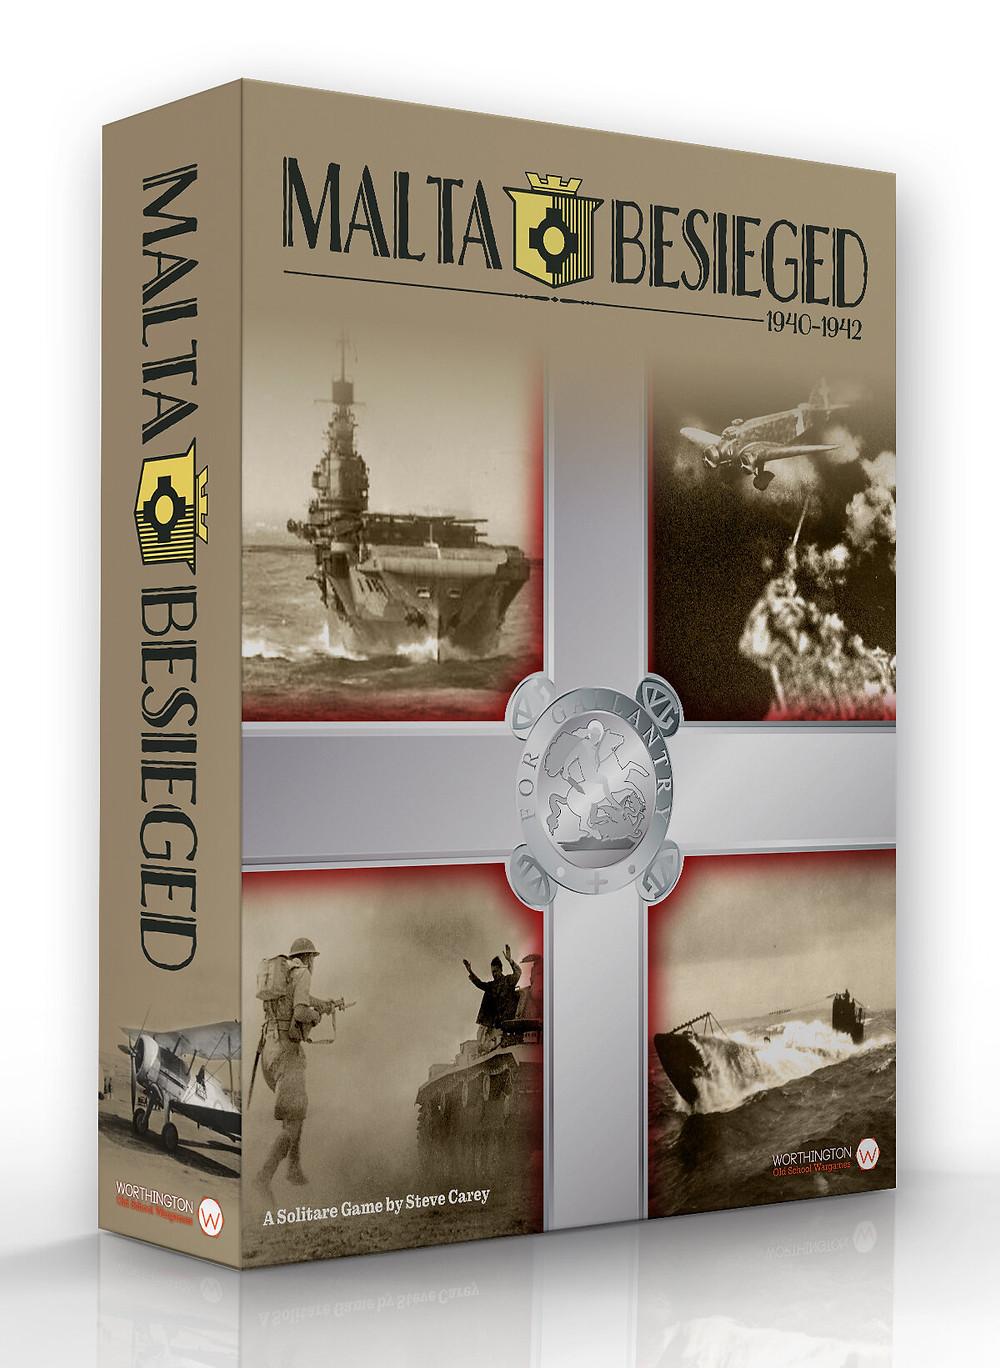 Malta Besieged box